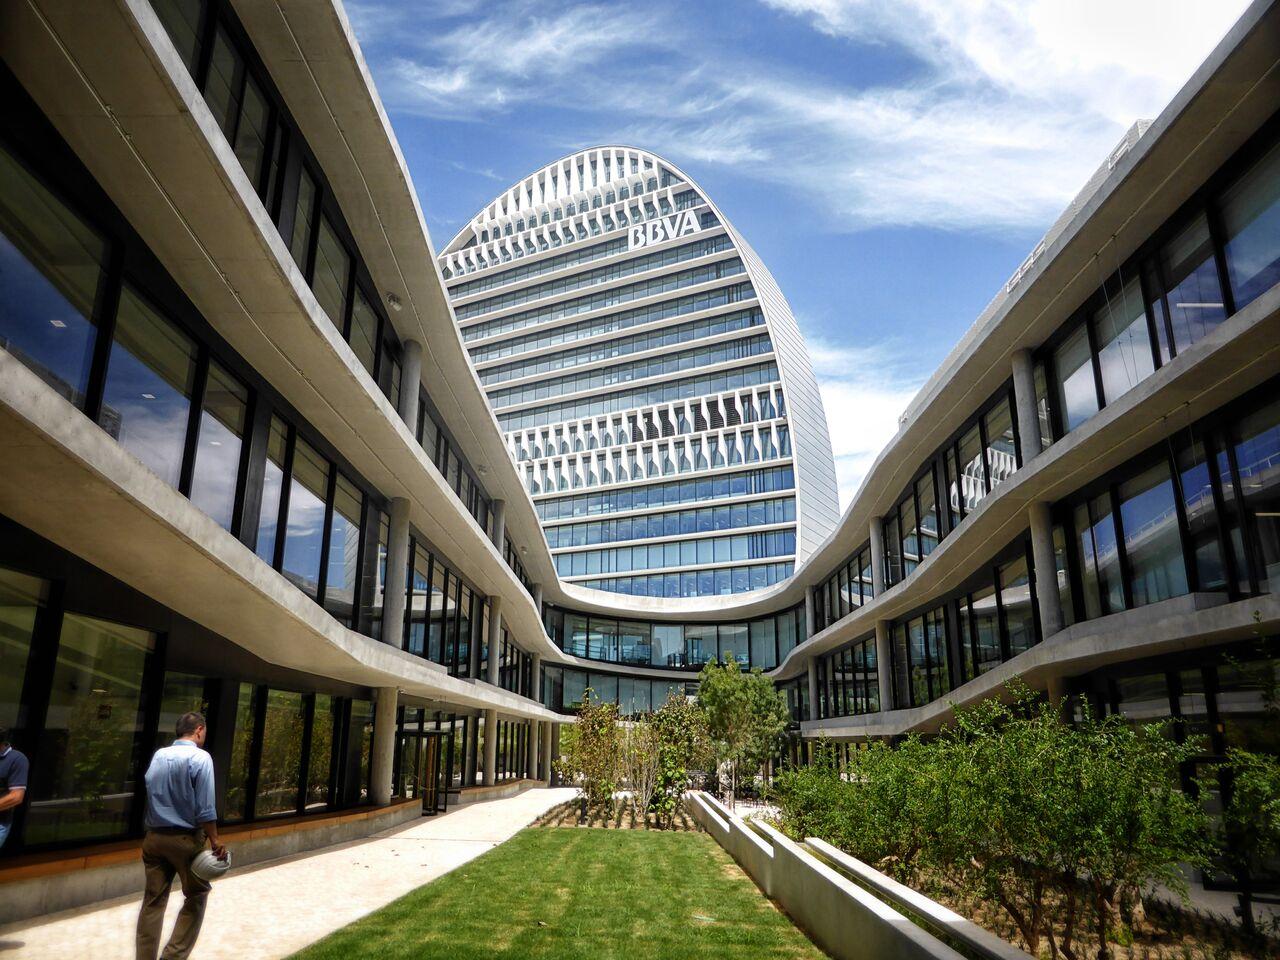 https://accionistaseinversores.bbva.com/wp-content/uploads/2019/01/La-Vela-BBVA-3_OPEN-HOUSE-MADRID_PATI-NUNEZ-AGENCY-1.jpg